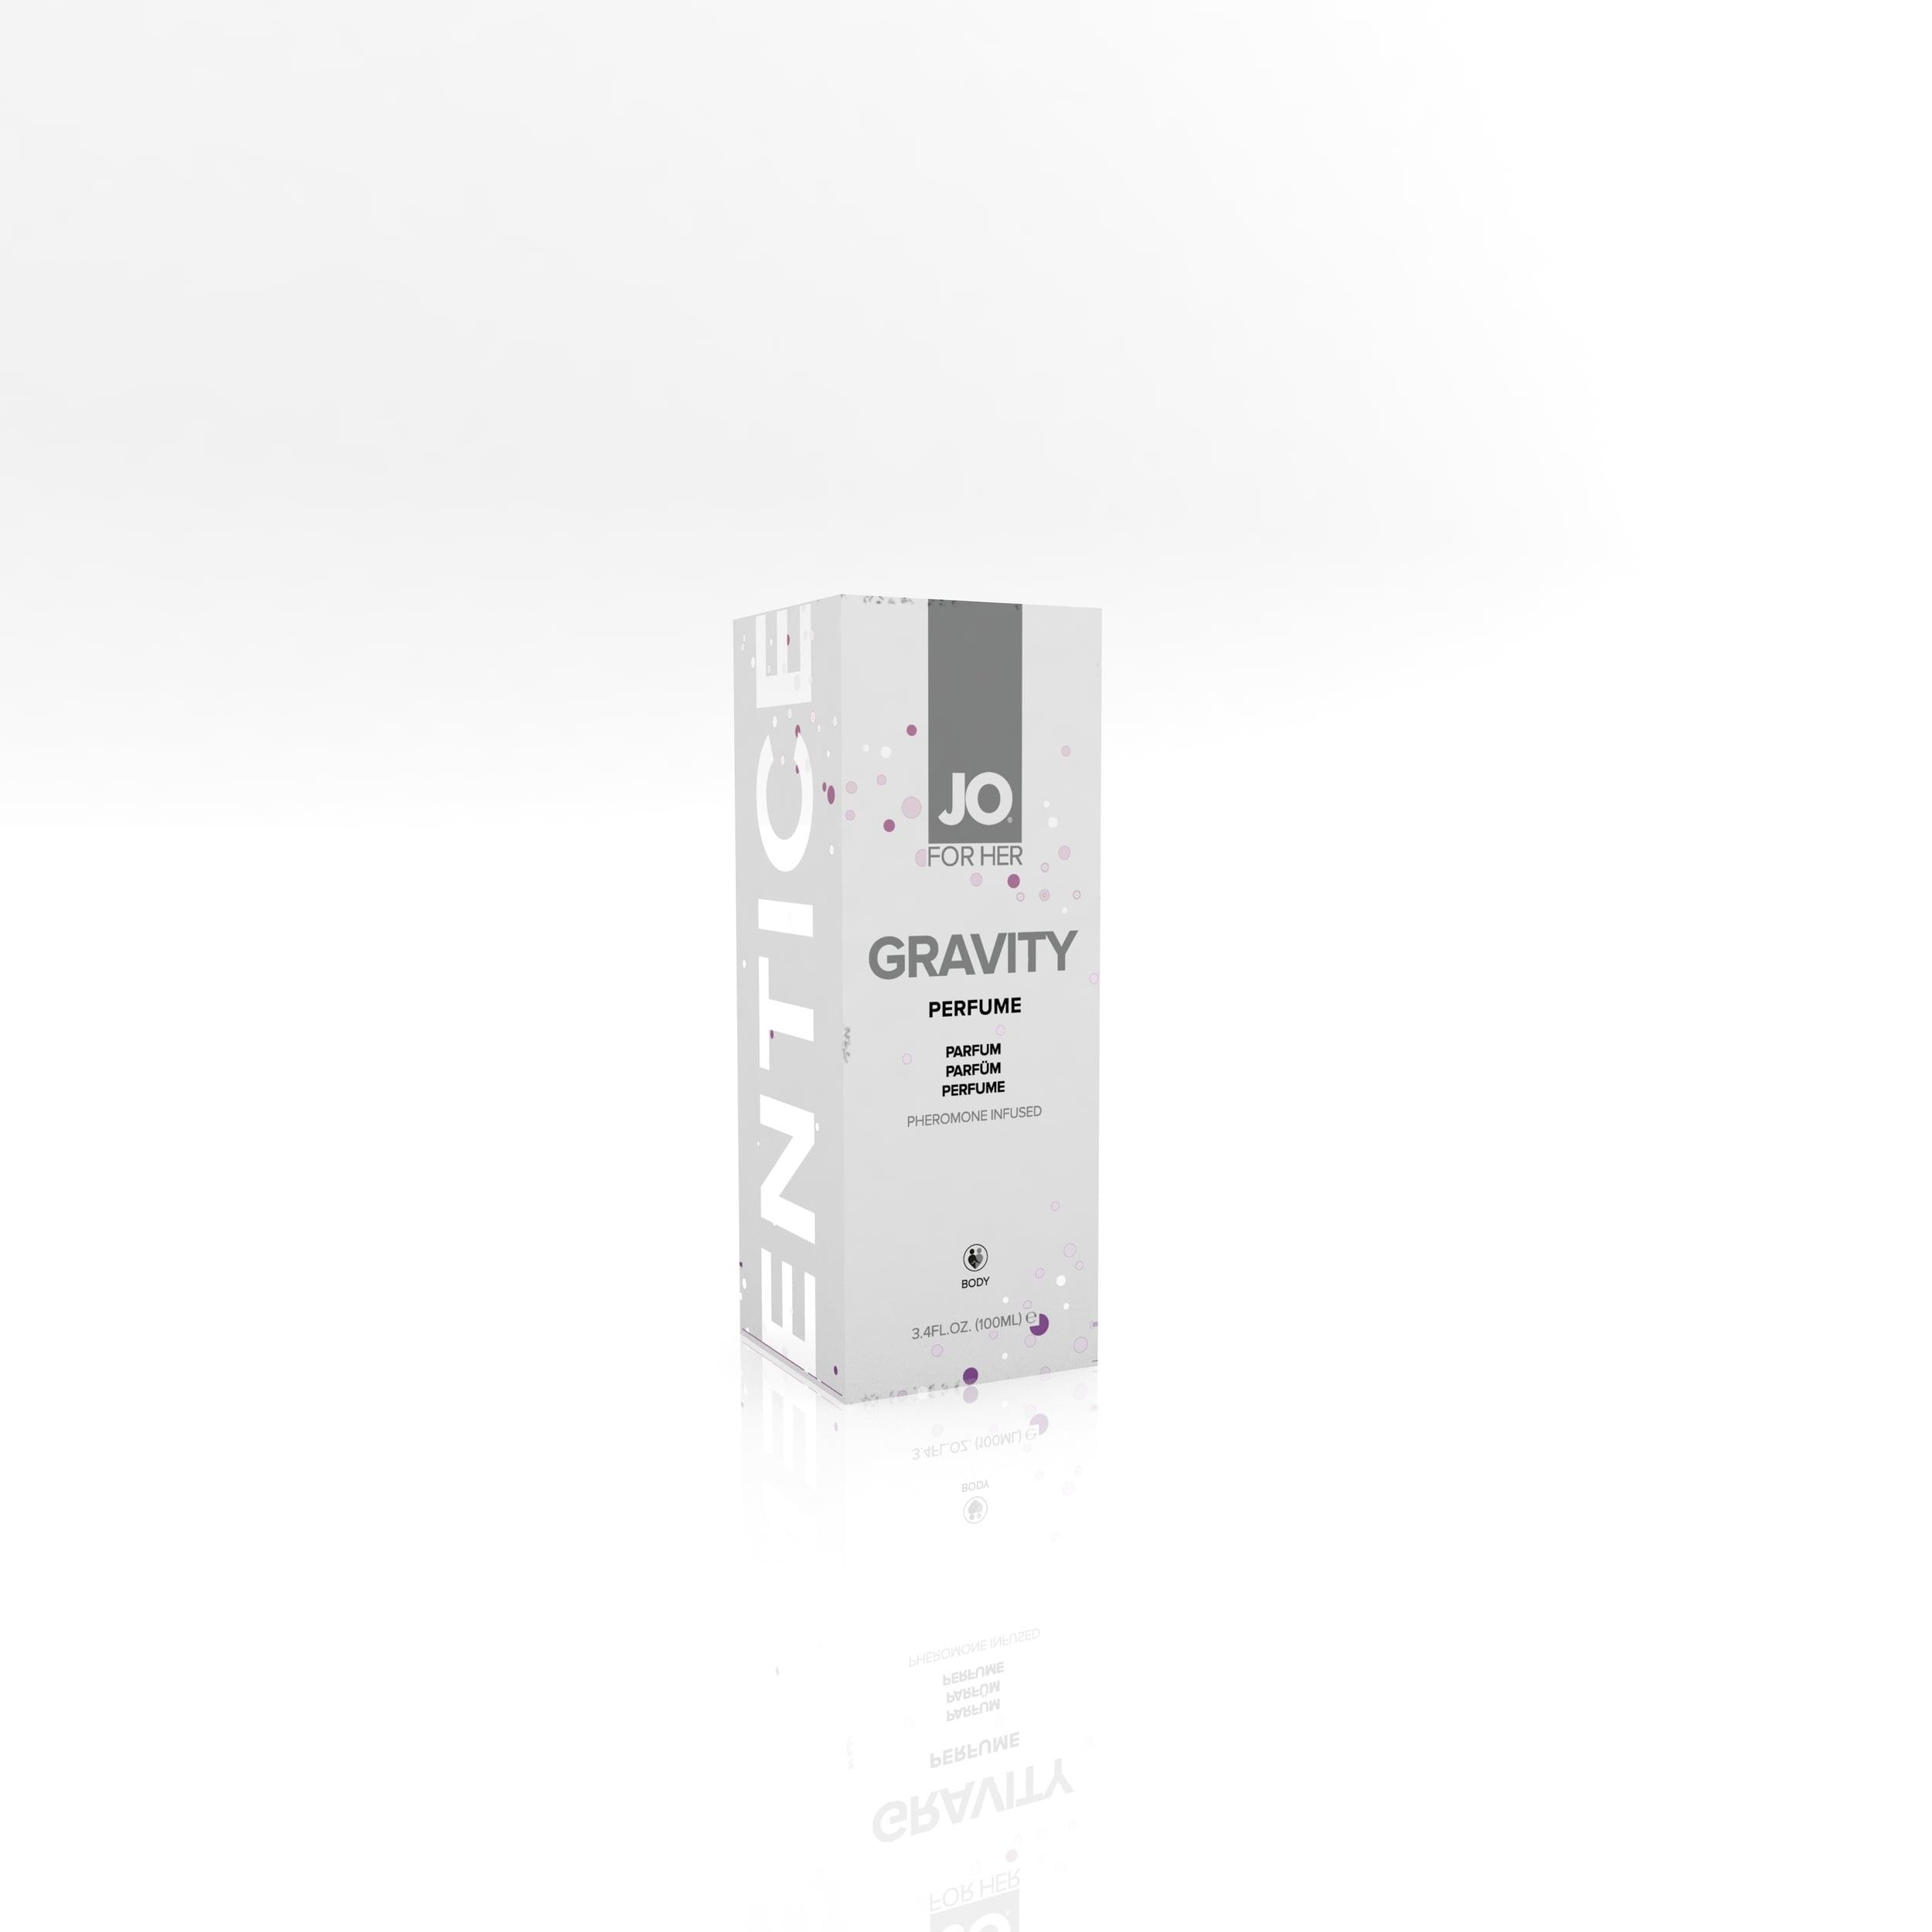 40680 - JO GRAVITY - PERFUME - INFUSED WITH PHEROMONES - FOR HER - 3.7fl.oz.jpg